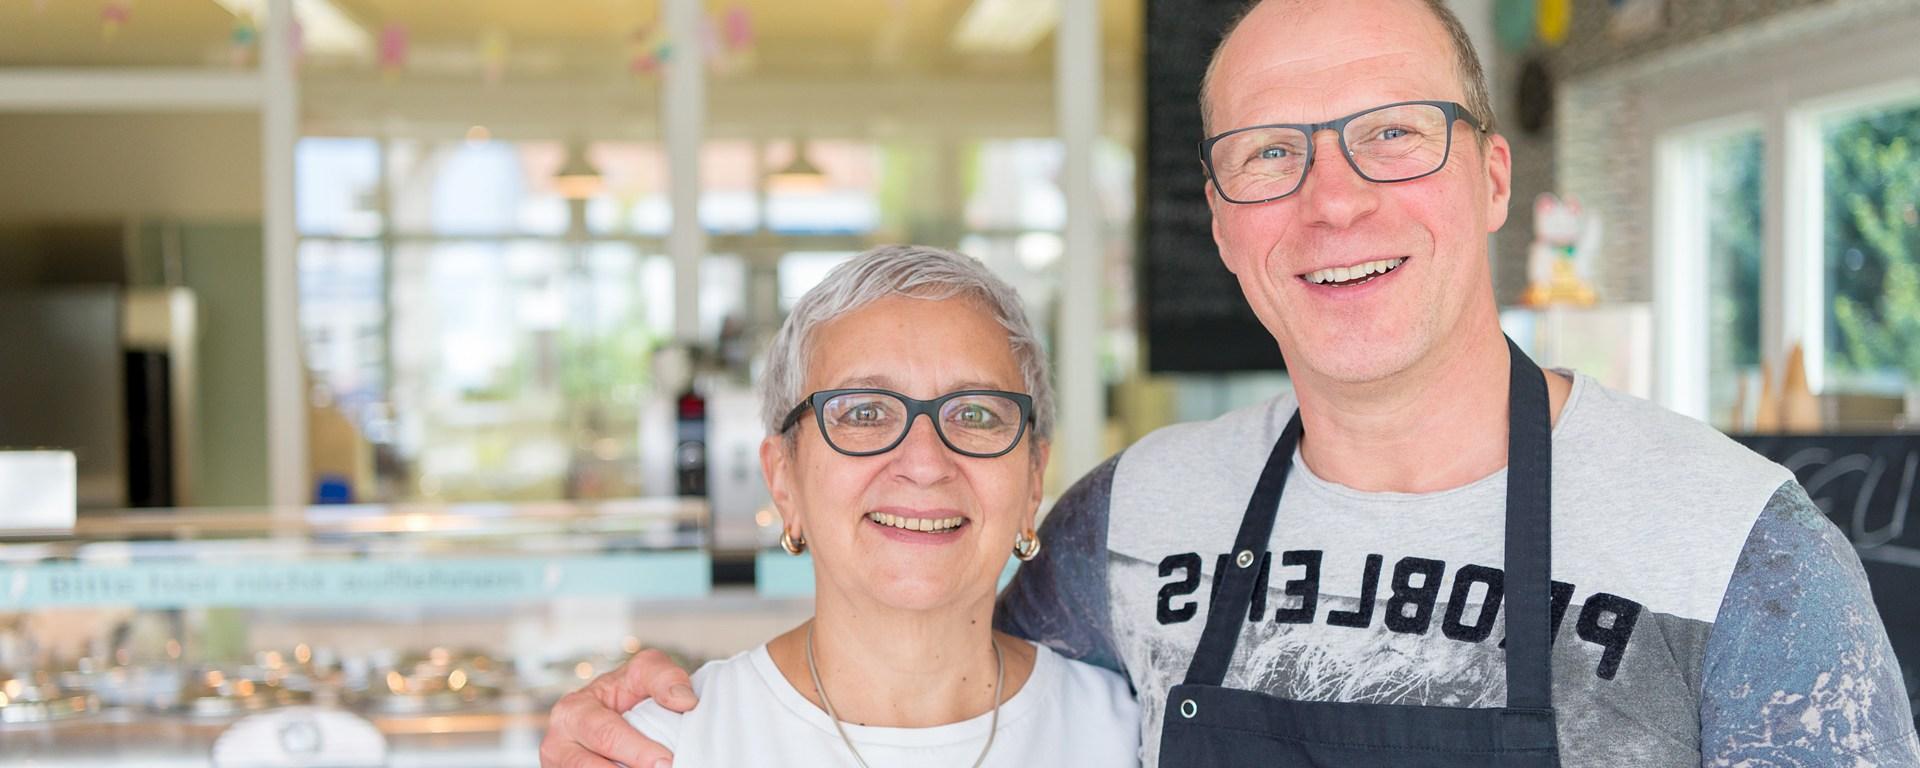 Christine und Jörg Borkowski vom Eiscafé Wolfenbütteler Eismanufaktur.